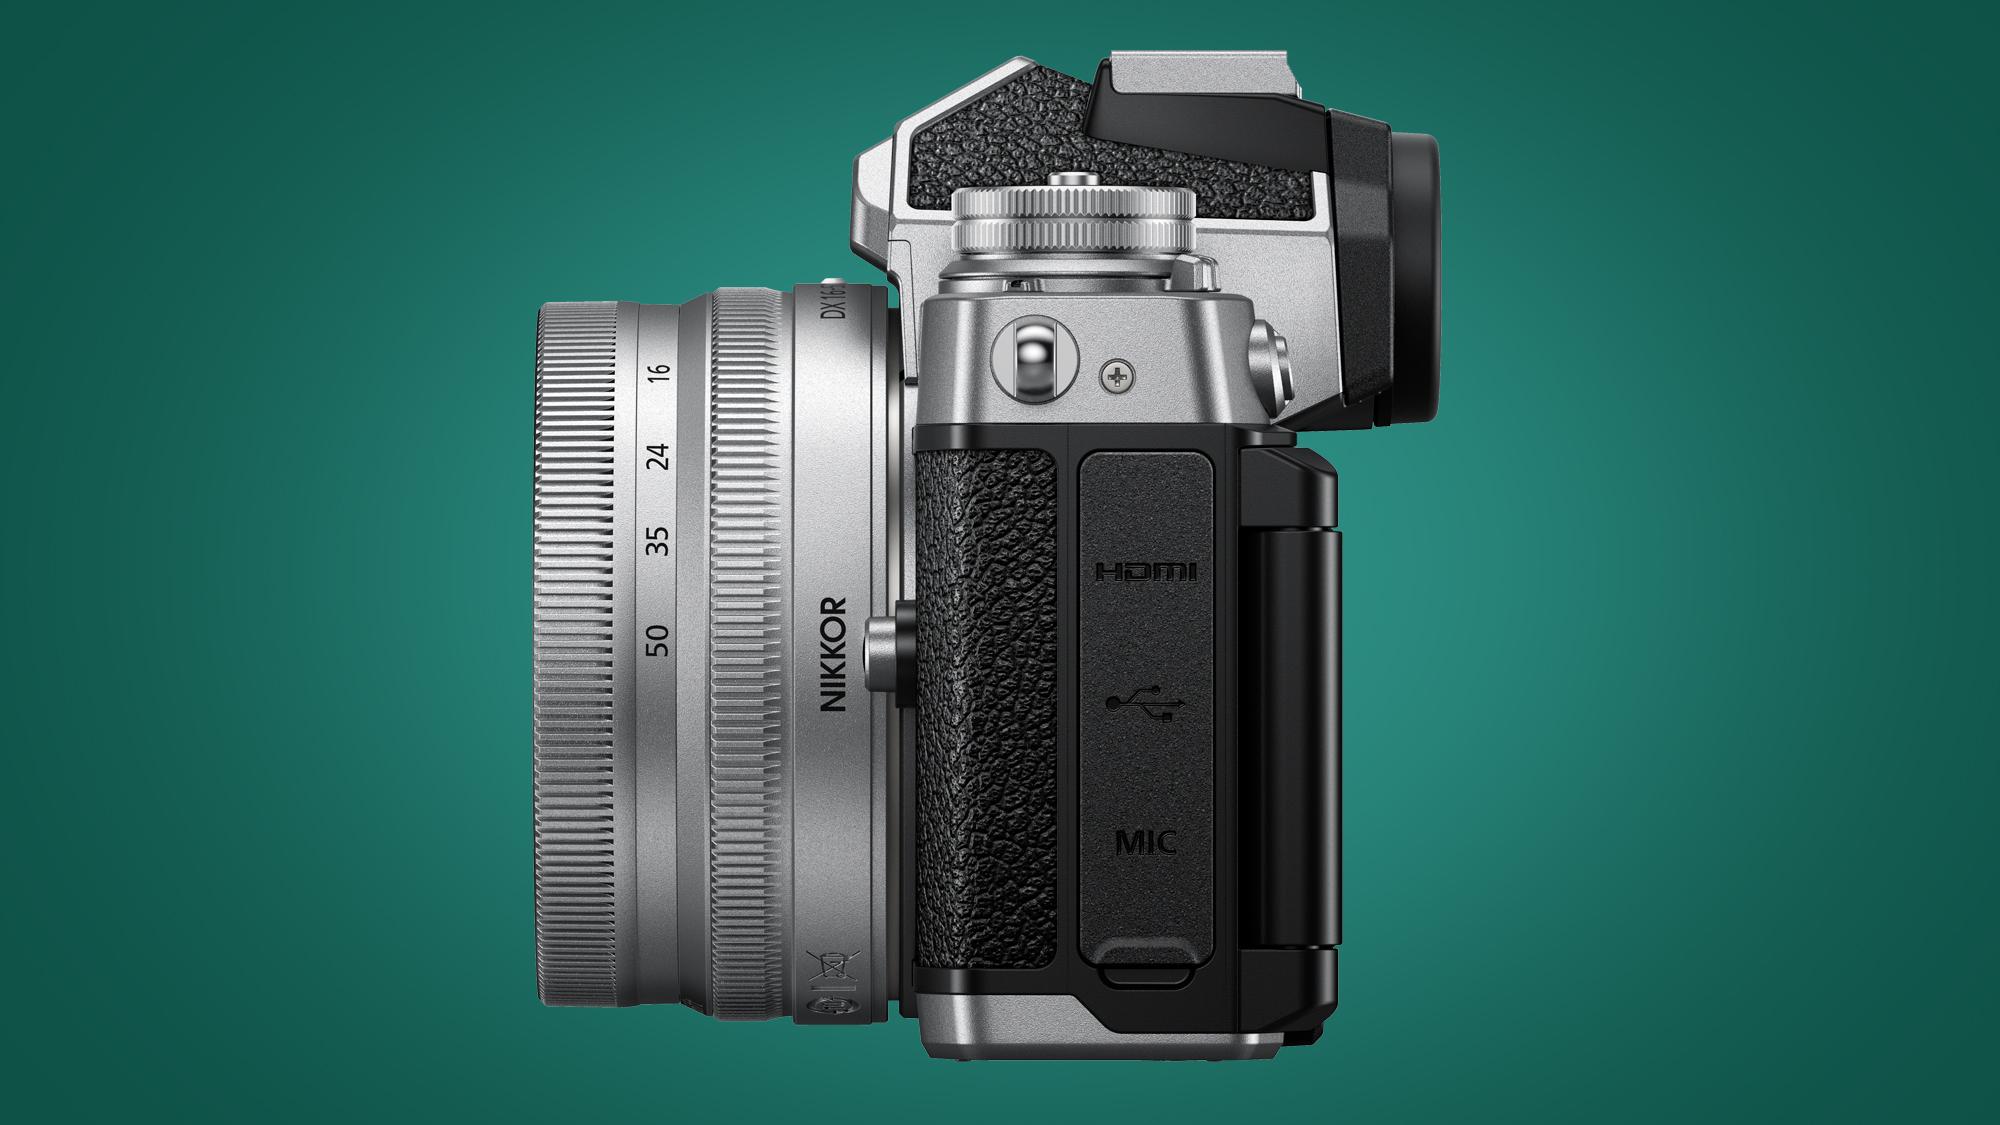 Image of Nikon Zfc ports side-on